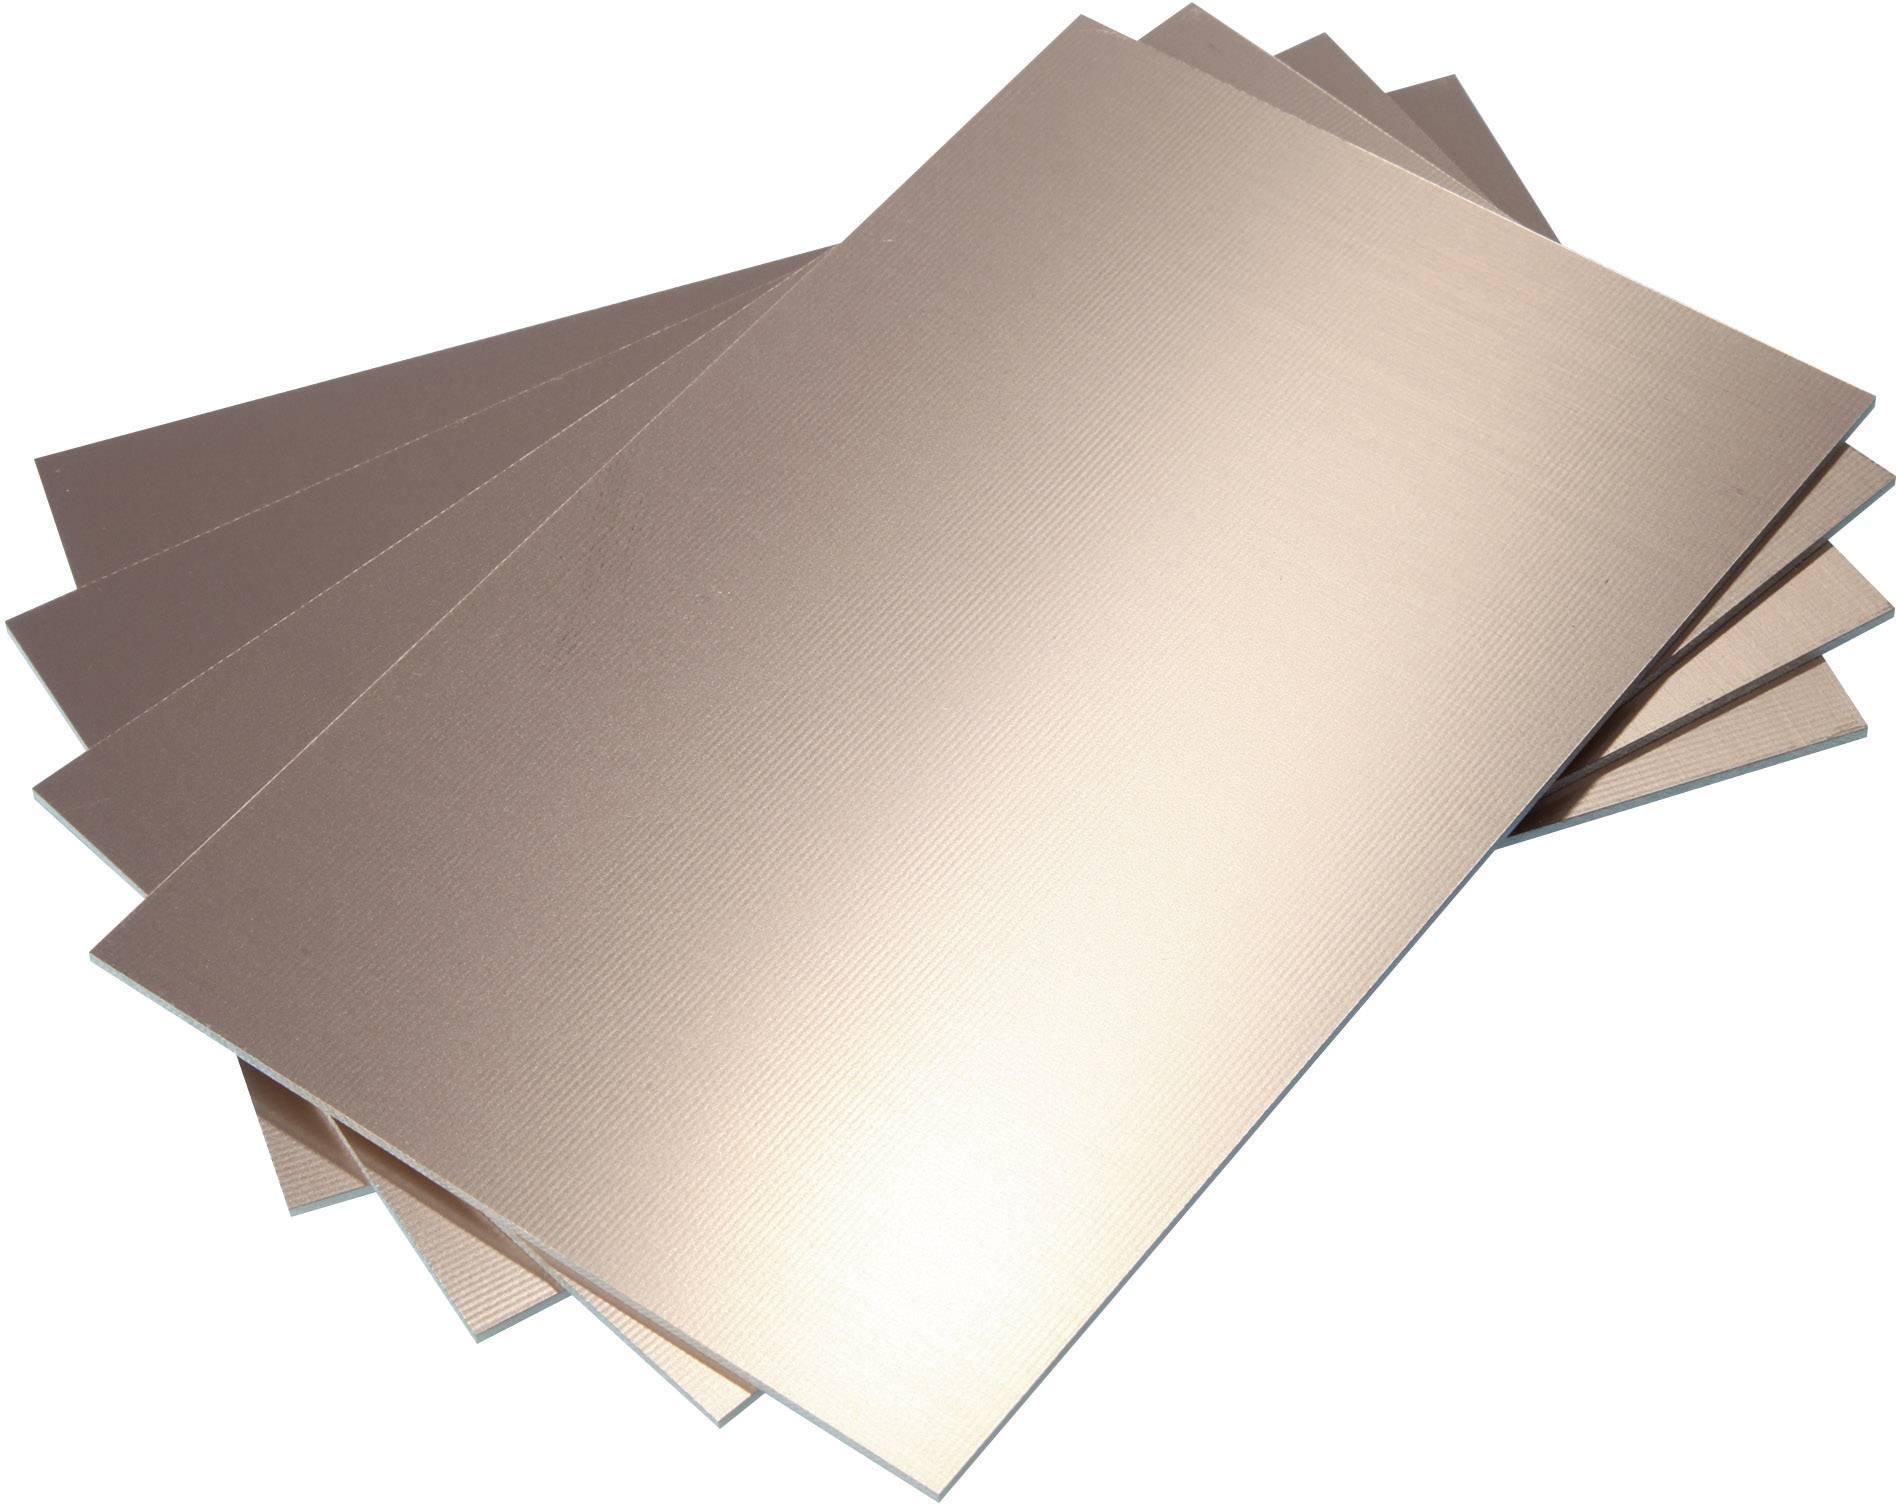 Cuprextit Bungard 030306E30, tvrzený papír, jednostranný, 100 x 75 x 1,5 mm